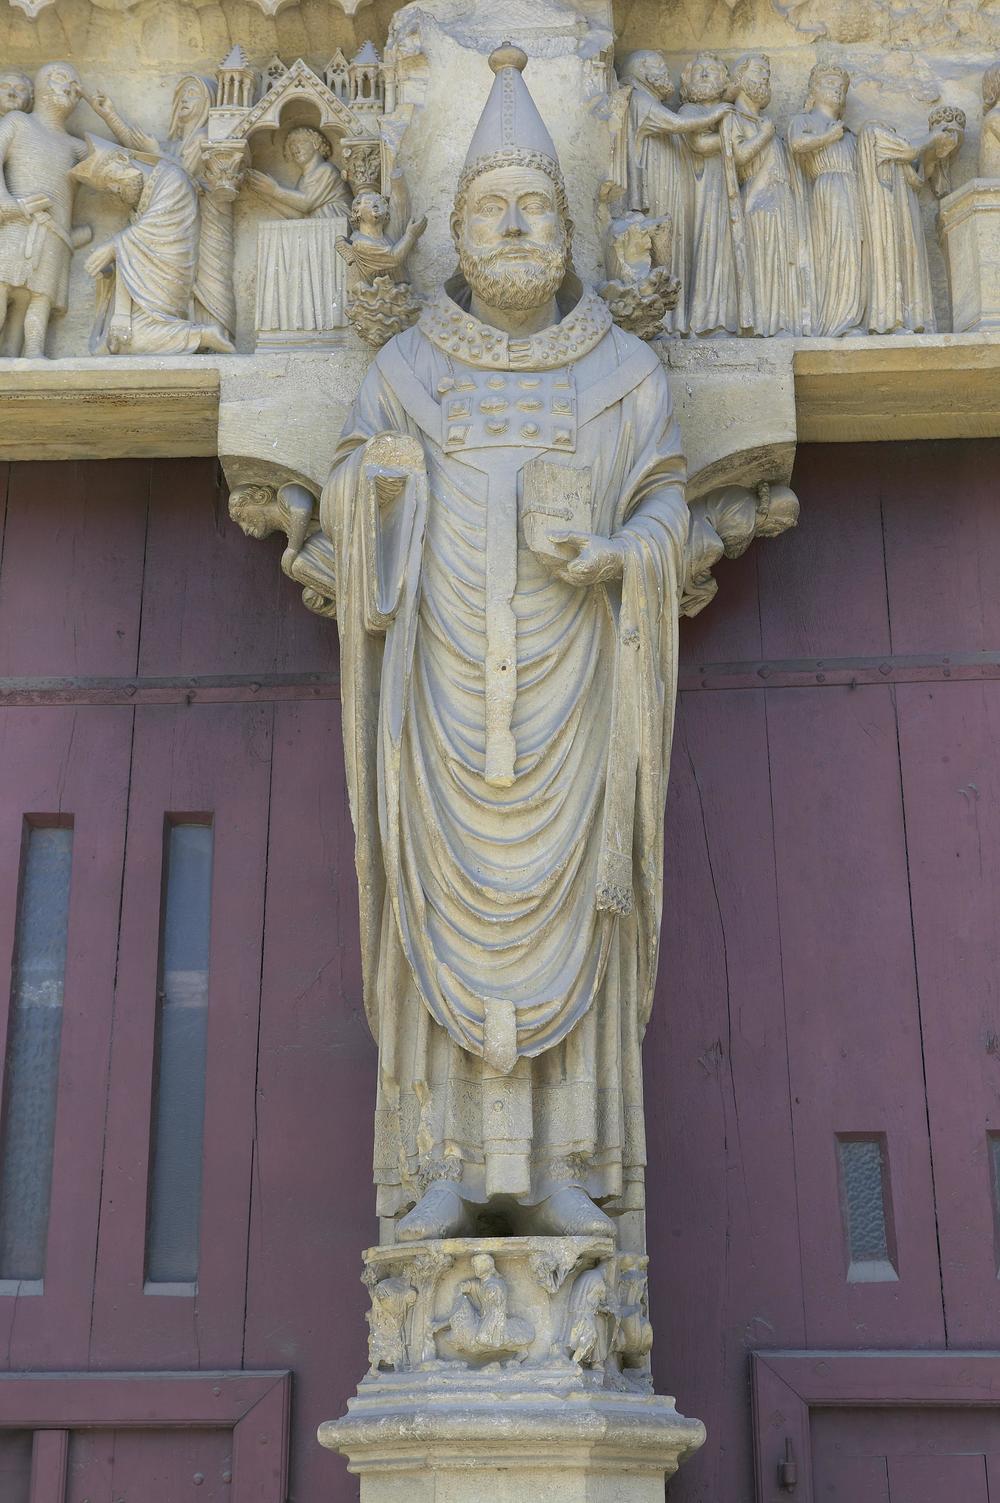 Trumeau Figure: Saint Calixtus I